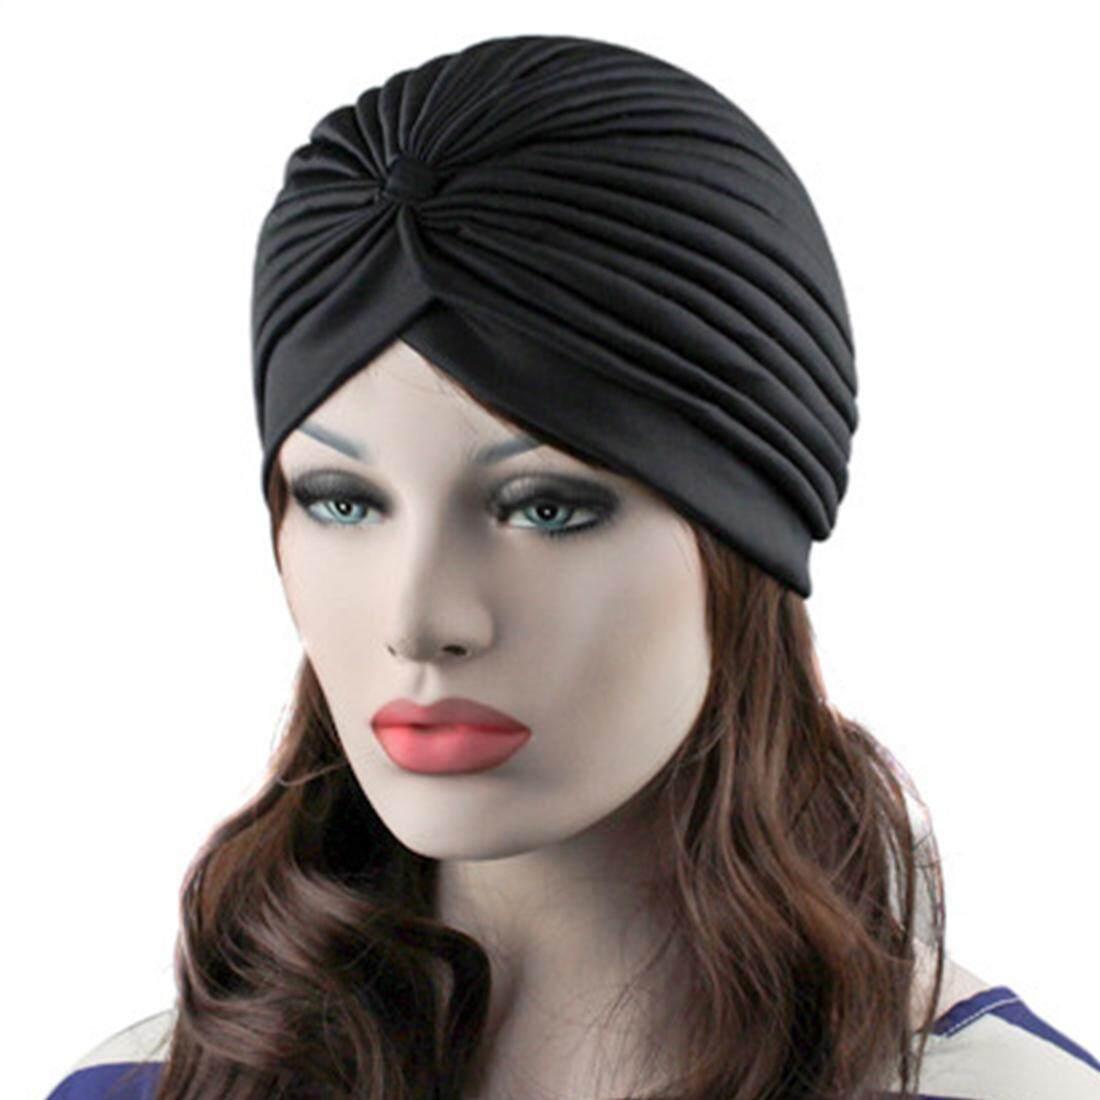 96c148eb224 Head Wrap Knit Bonnet Twisted Pleated Stretchable Turban Hat Hair Wrap Cap  Women Cover Up Cap